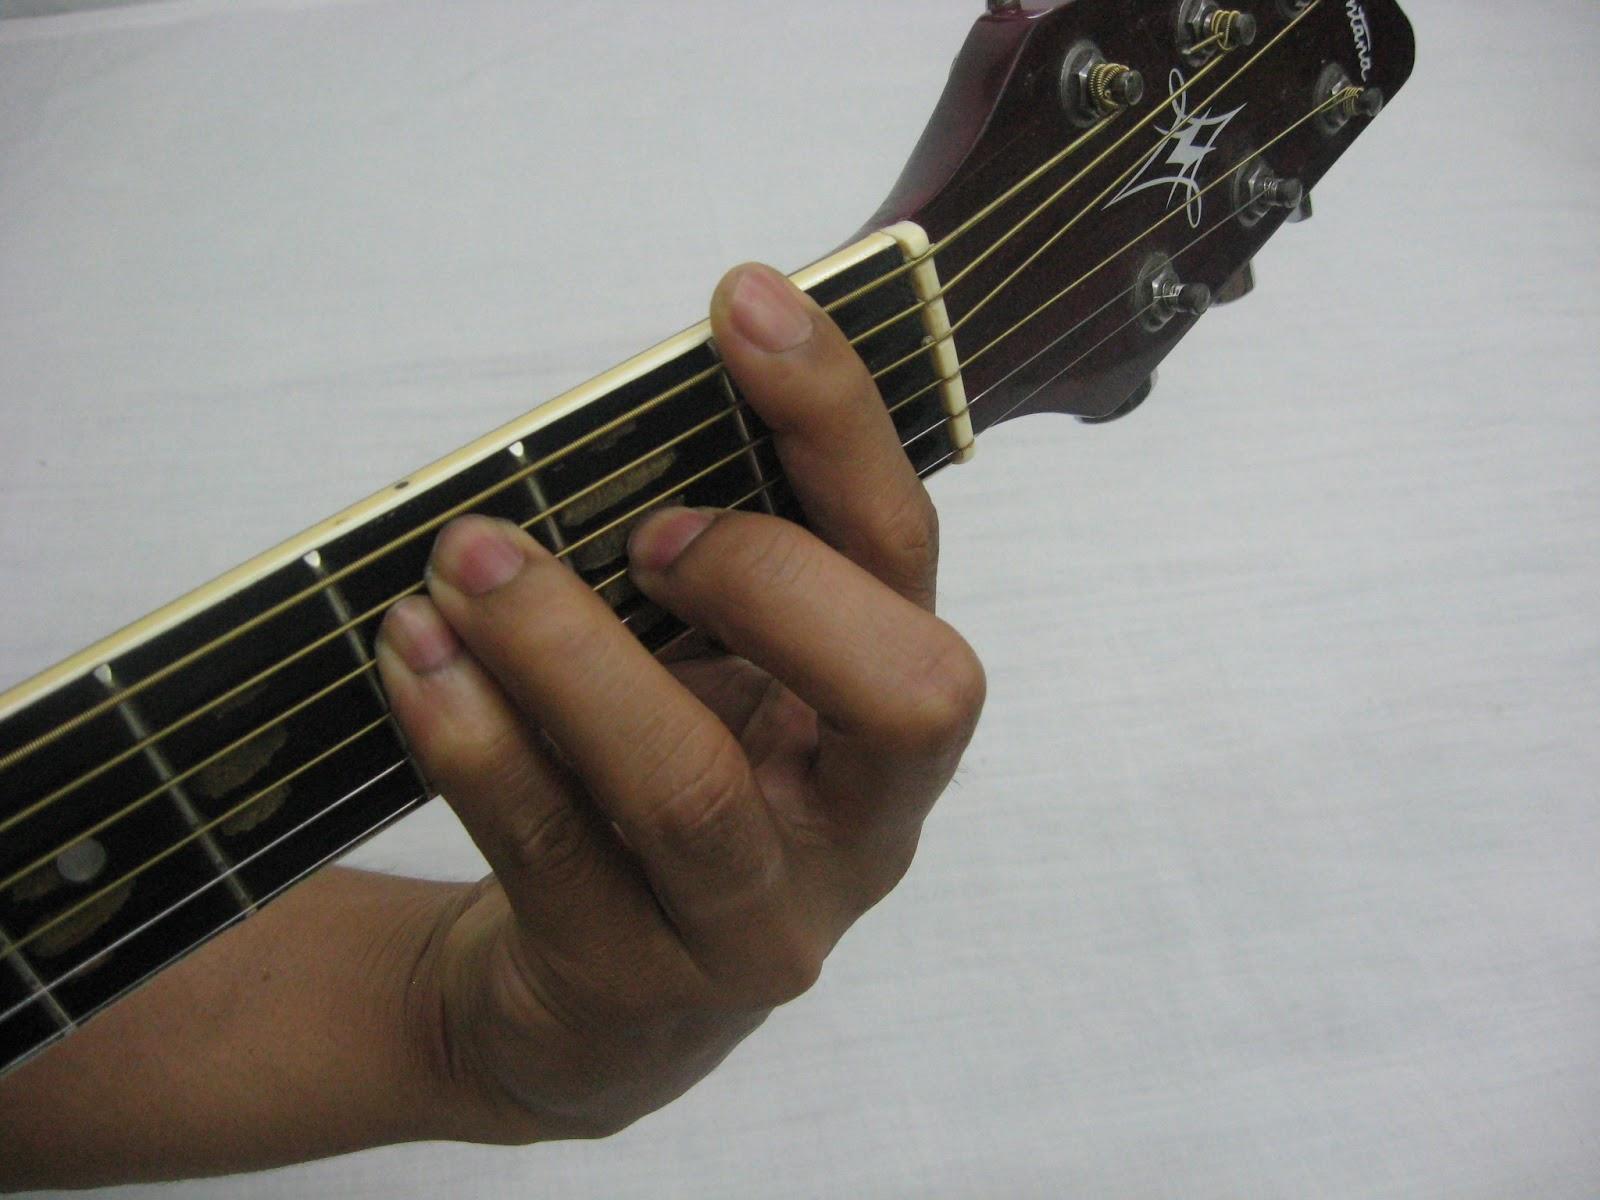 Am7 chord guitar finger